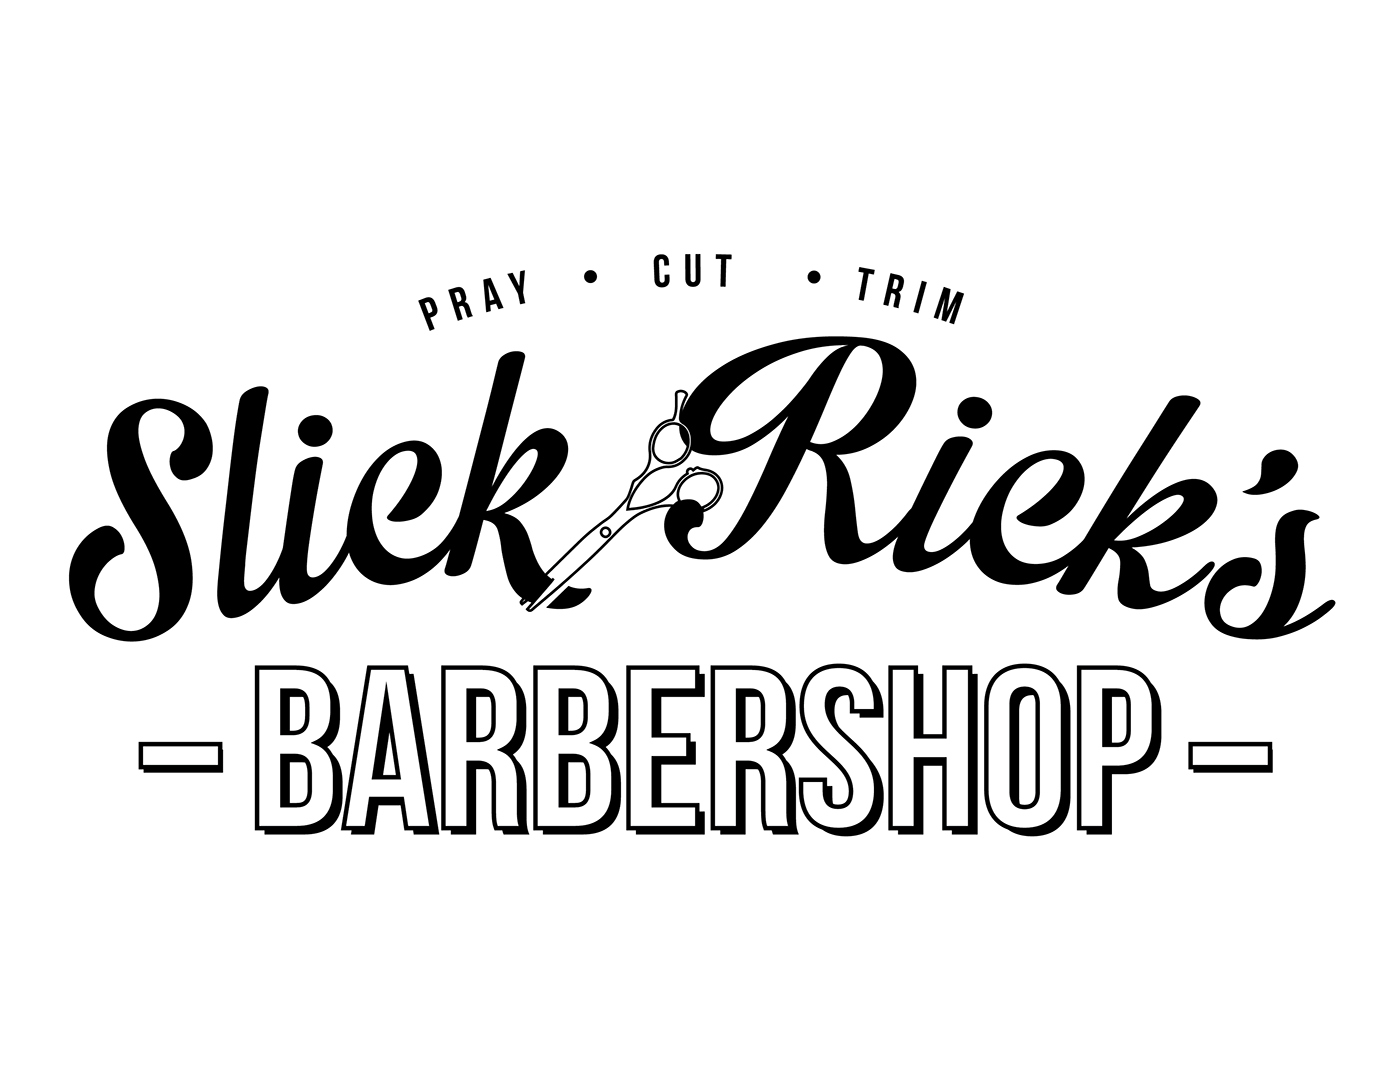 Rick S Barber Shop >> Slick Rick S Barbershop Brand Identity On Behance